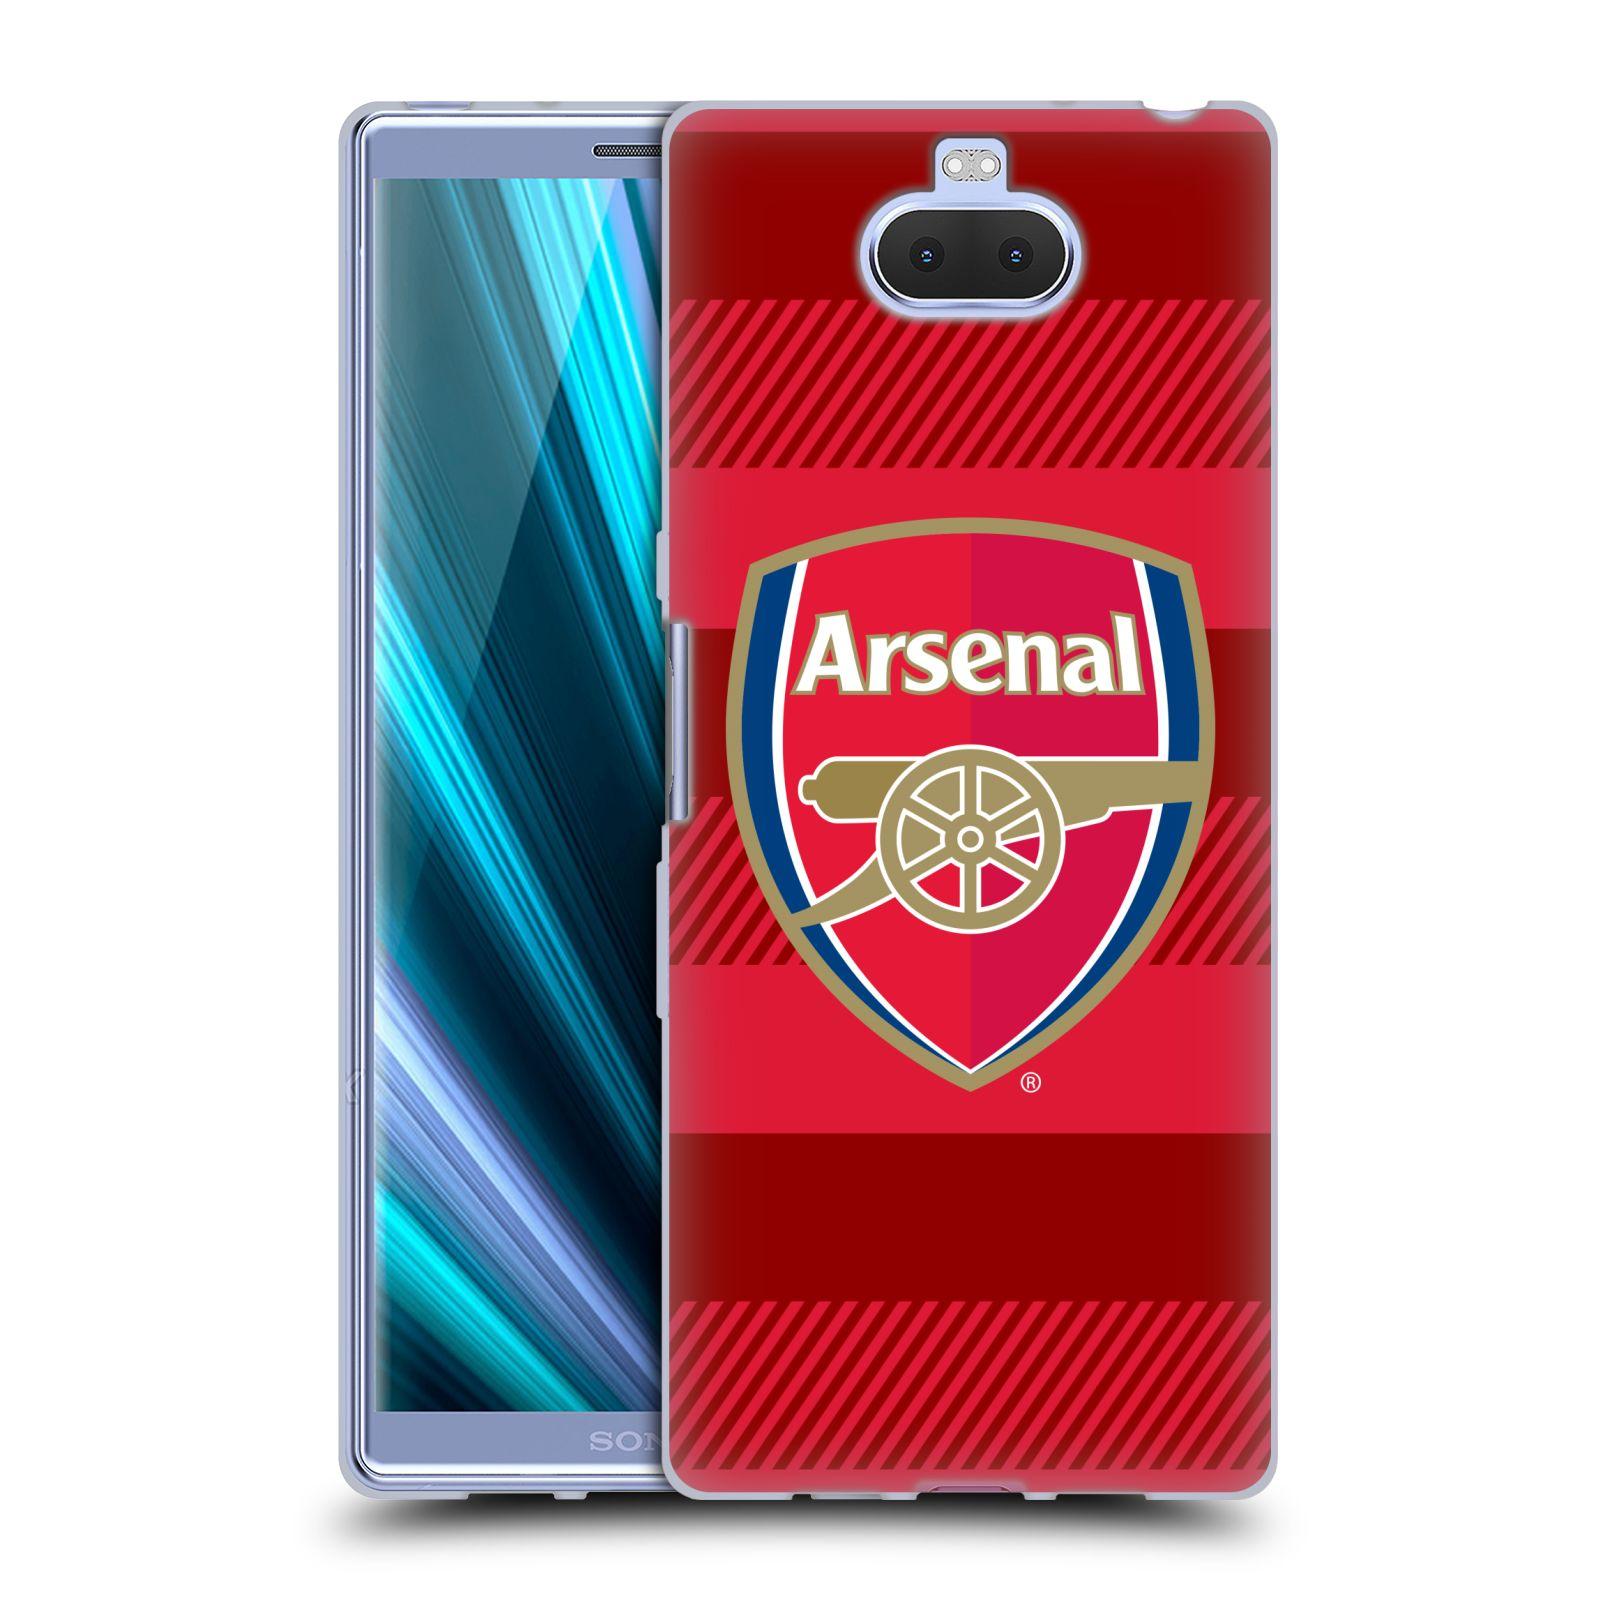 Silikonové pouzdro na mobil Sony Xperia 10 Plus - Head Case - Arsenal FC - Logo s pruhy